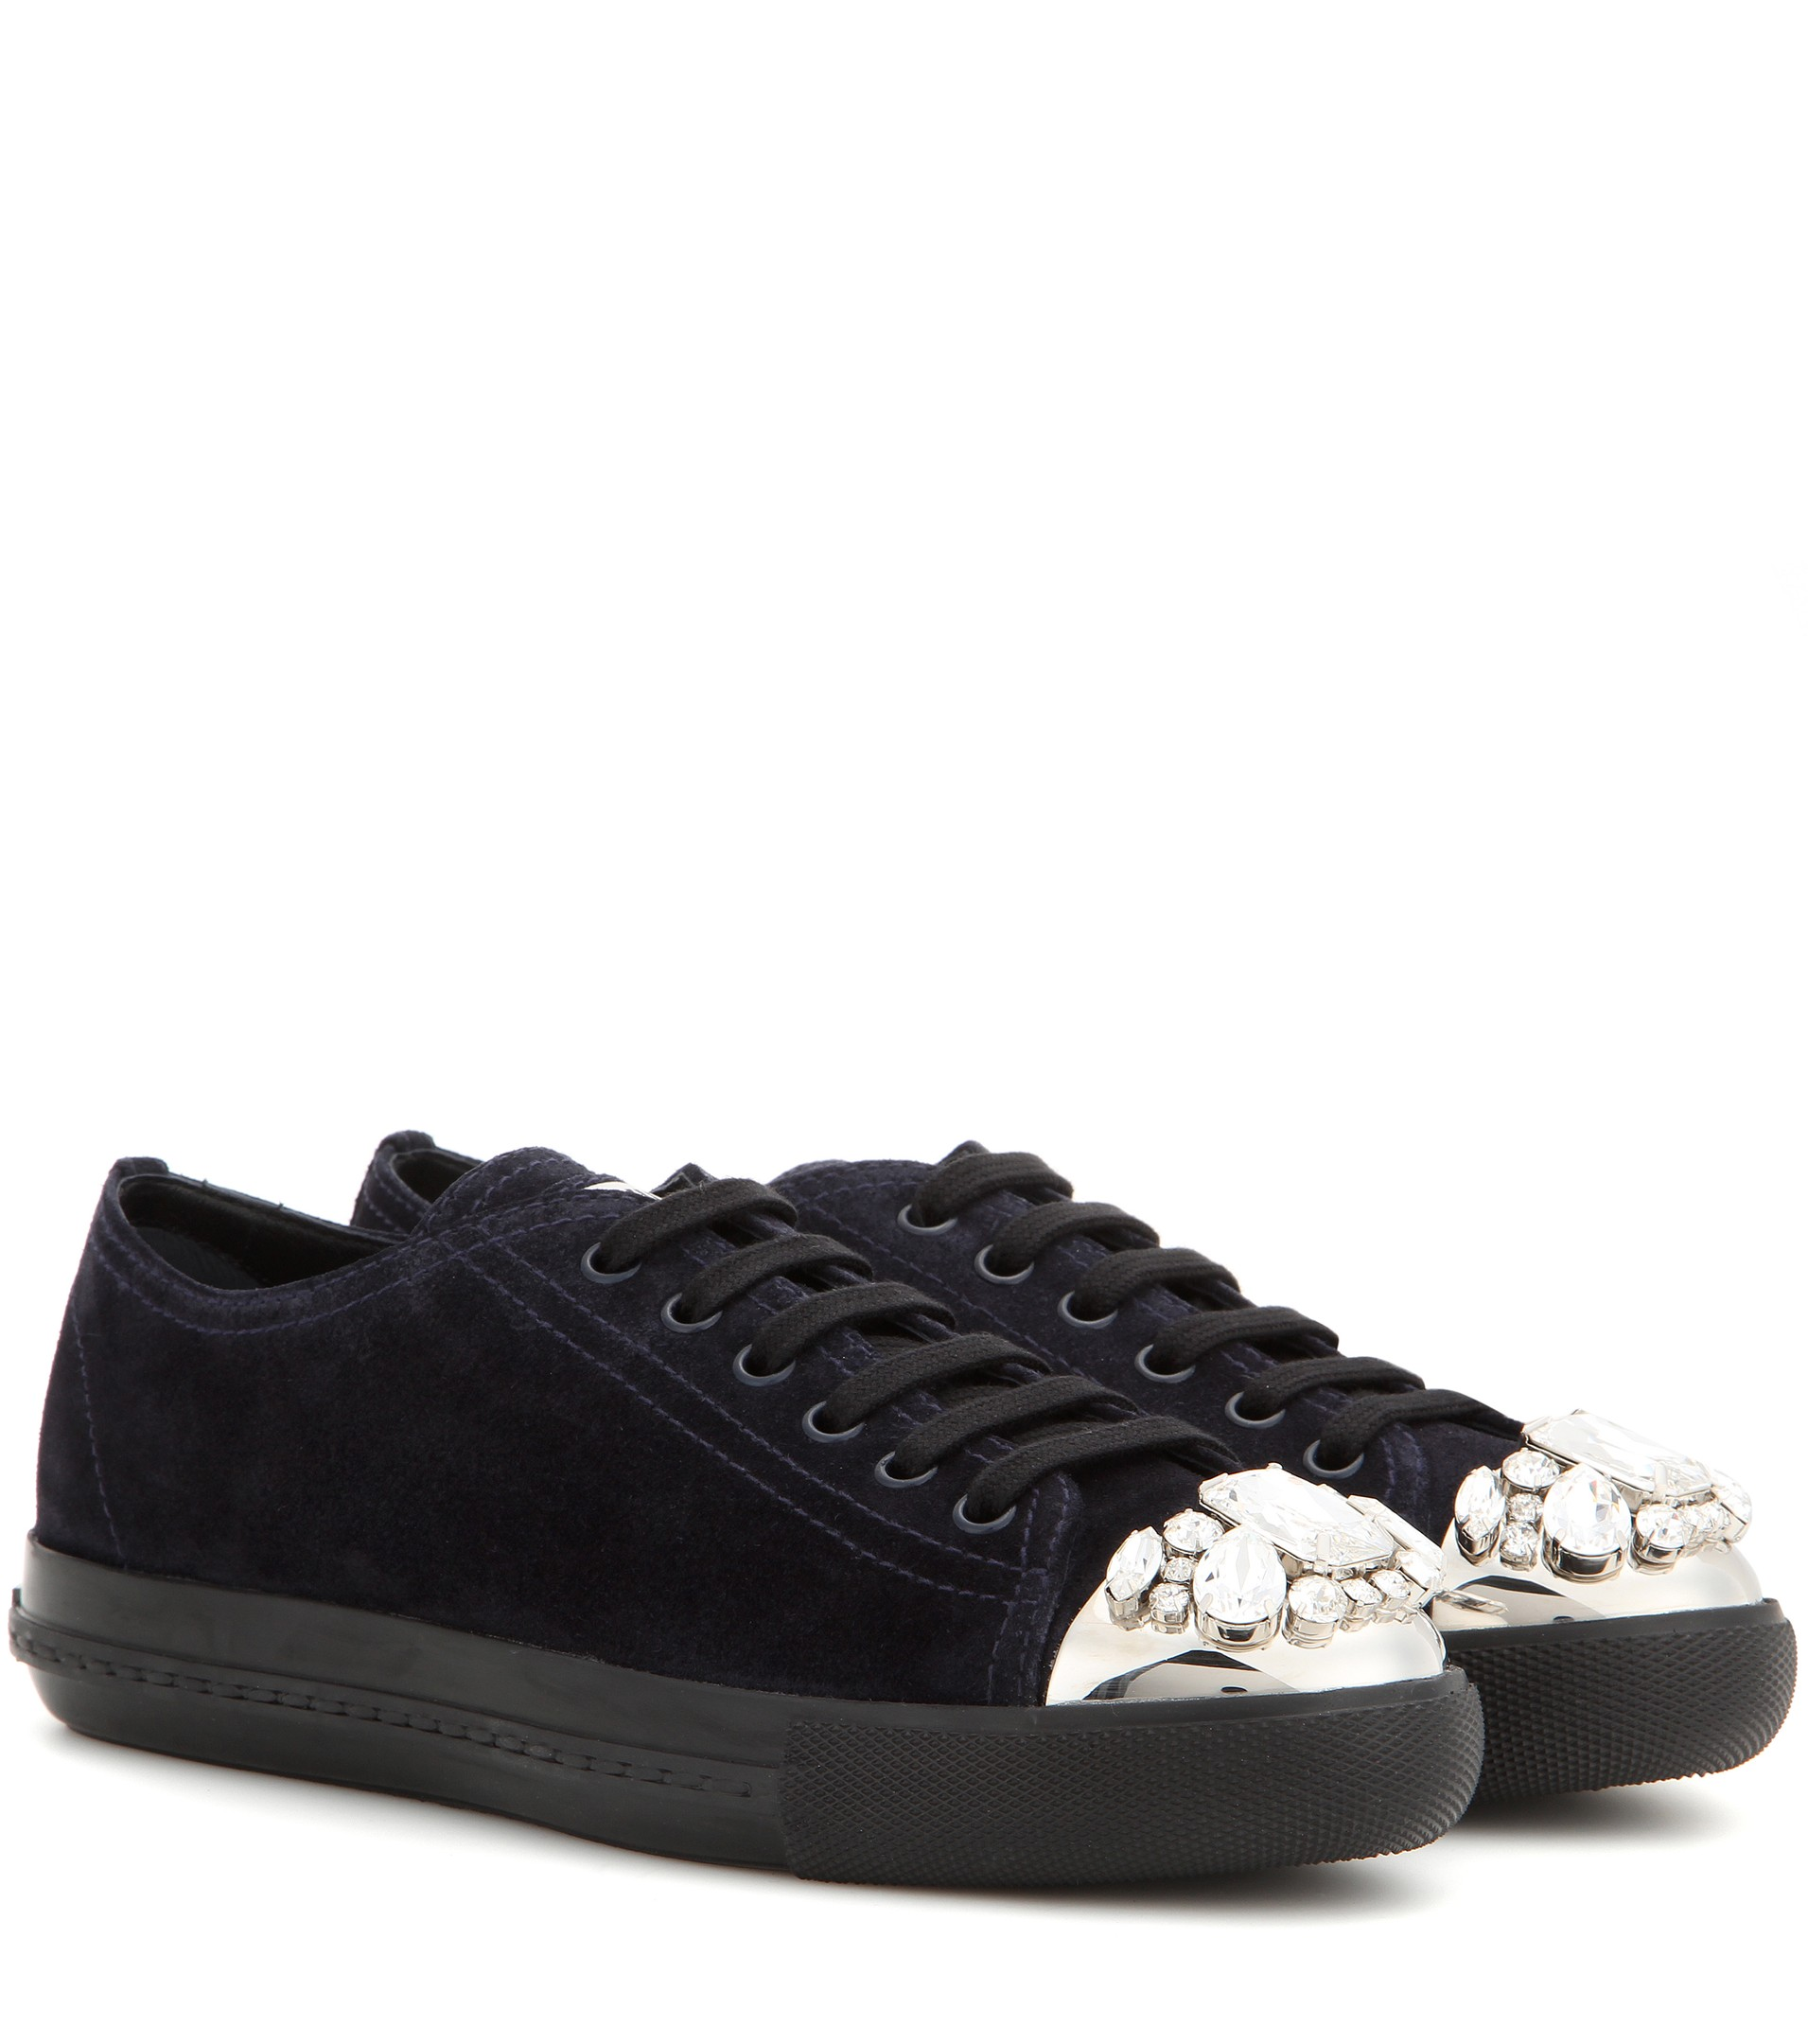 Miu Miu Embellished Suede Sneaker